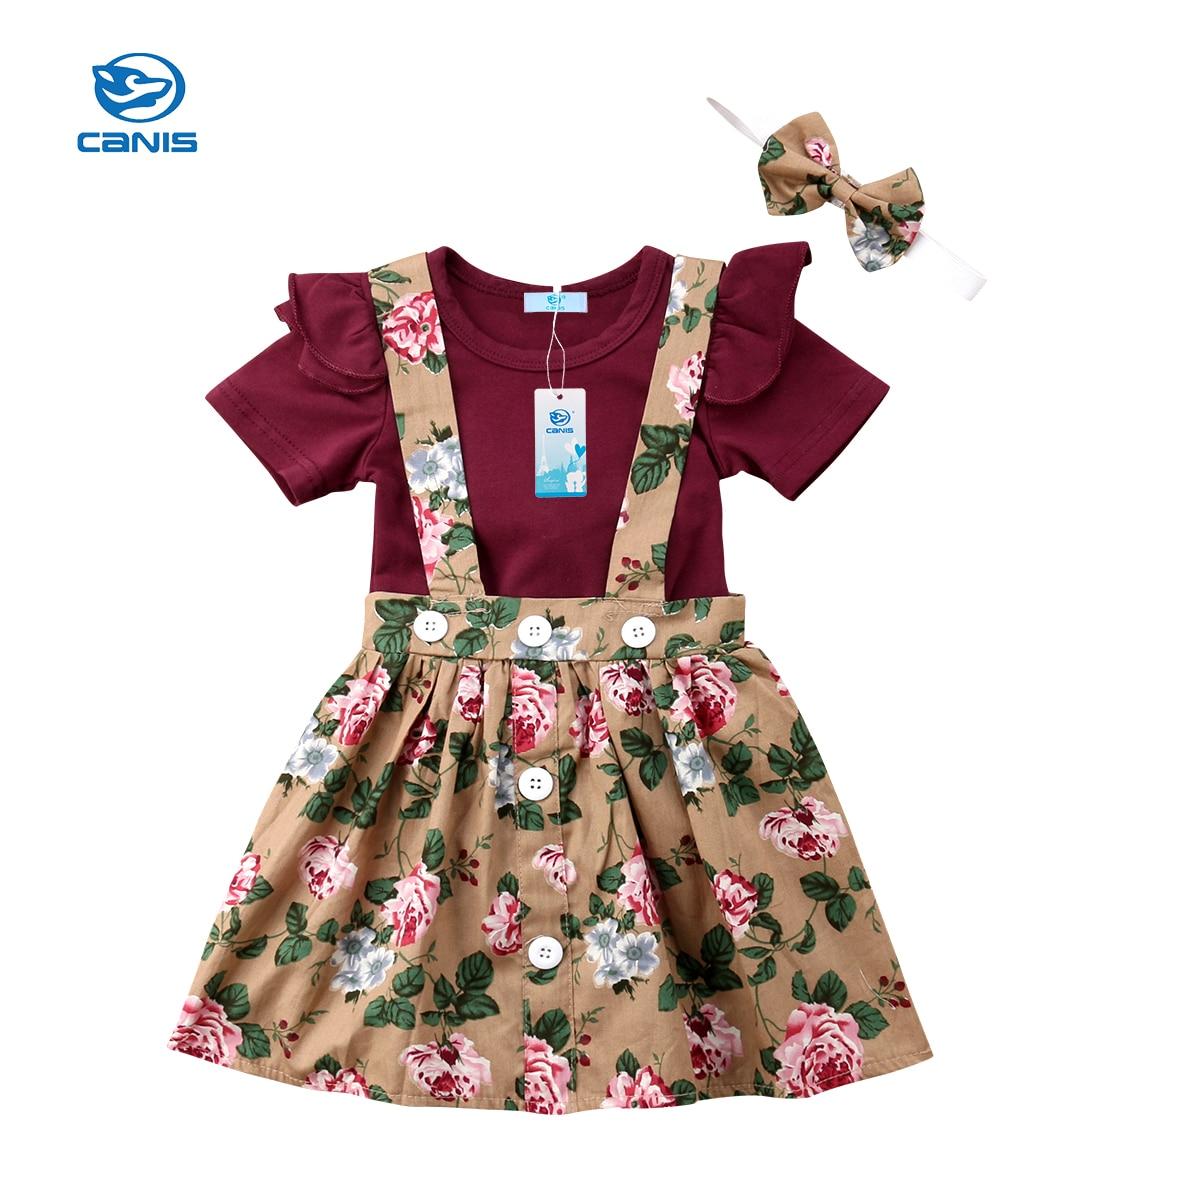 2018 Summer New Fashion Cute Sweet 3PCS Newborn Baby Girl Short Fly Sleeve Romper Floral Belt Dress Outfit